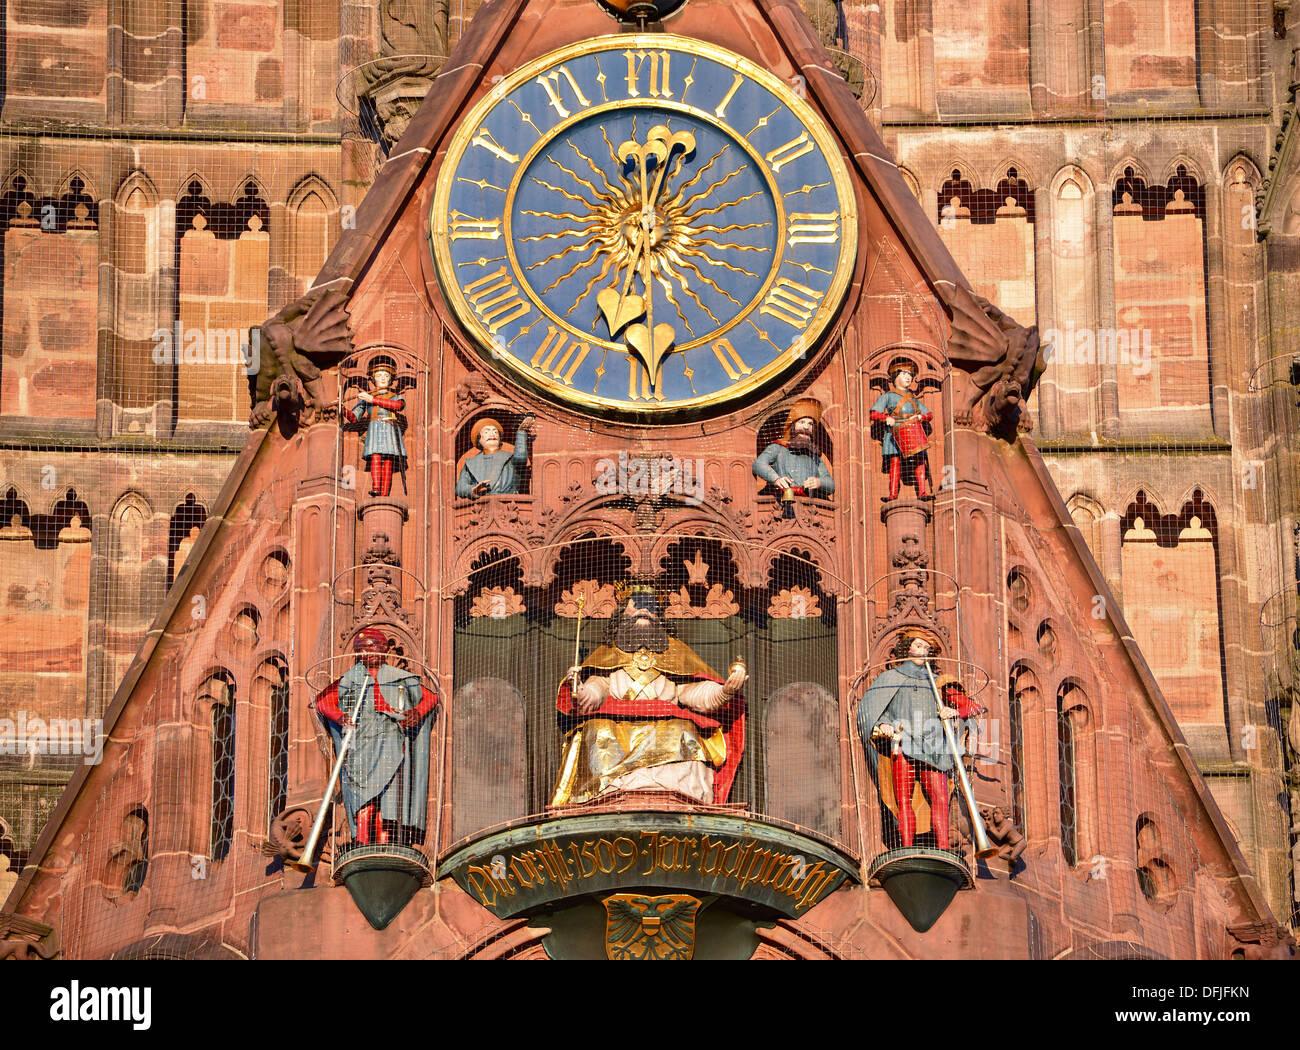 La Frauenkirche di Norimberga, Germania Immagini Stock